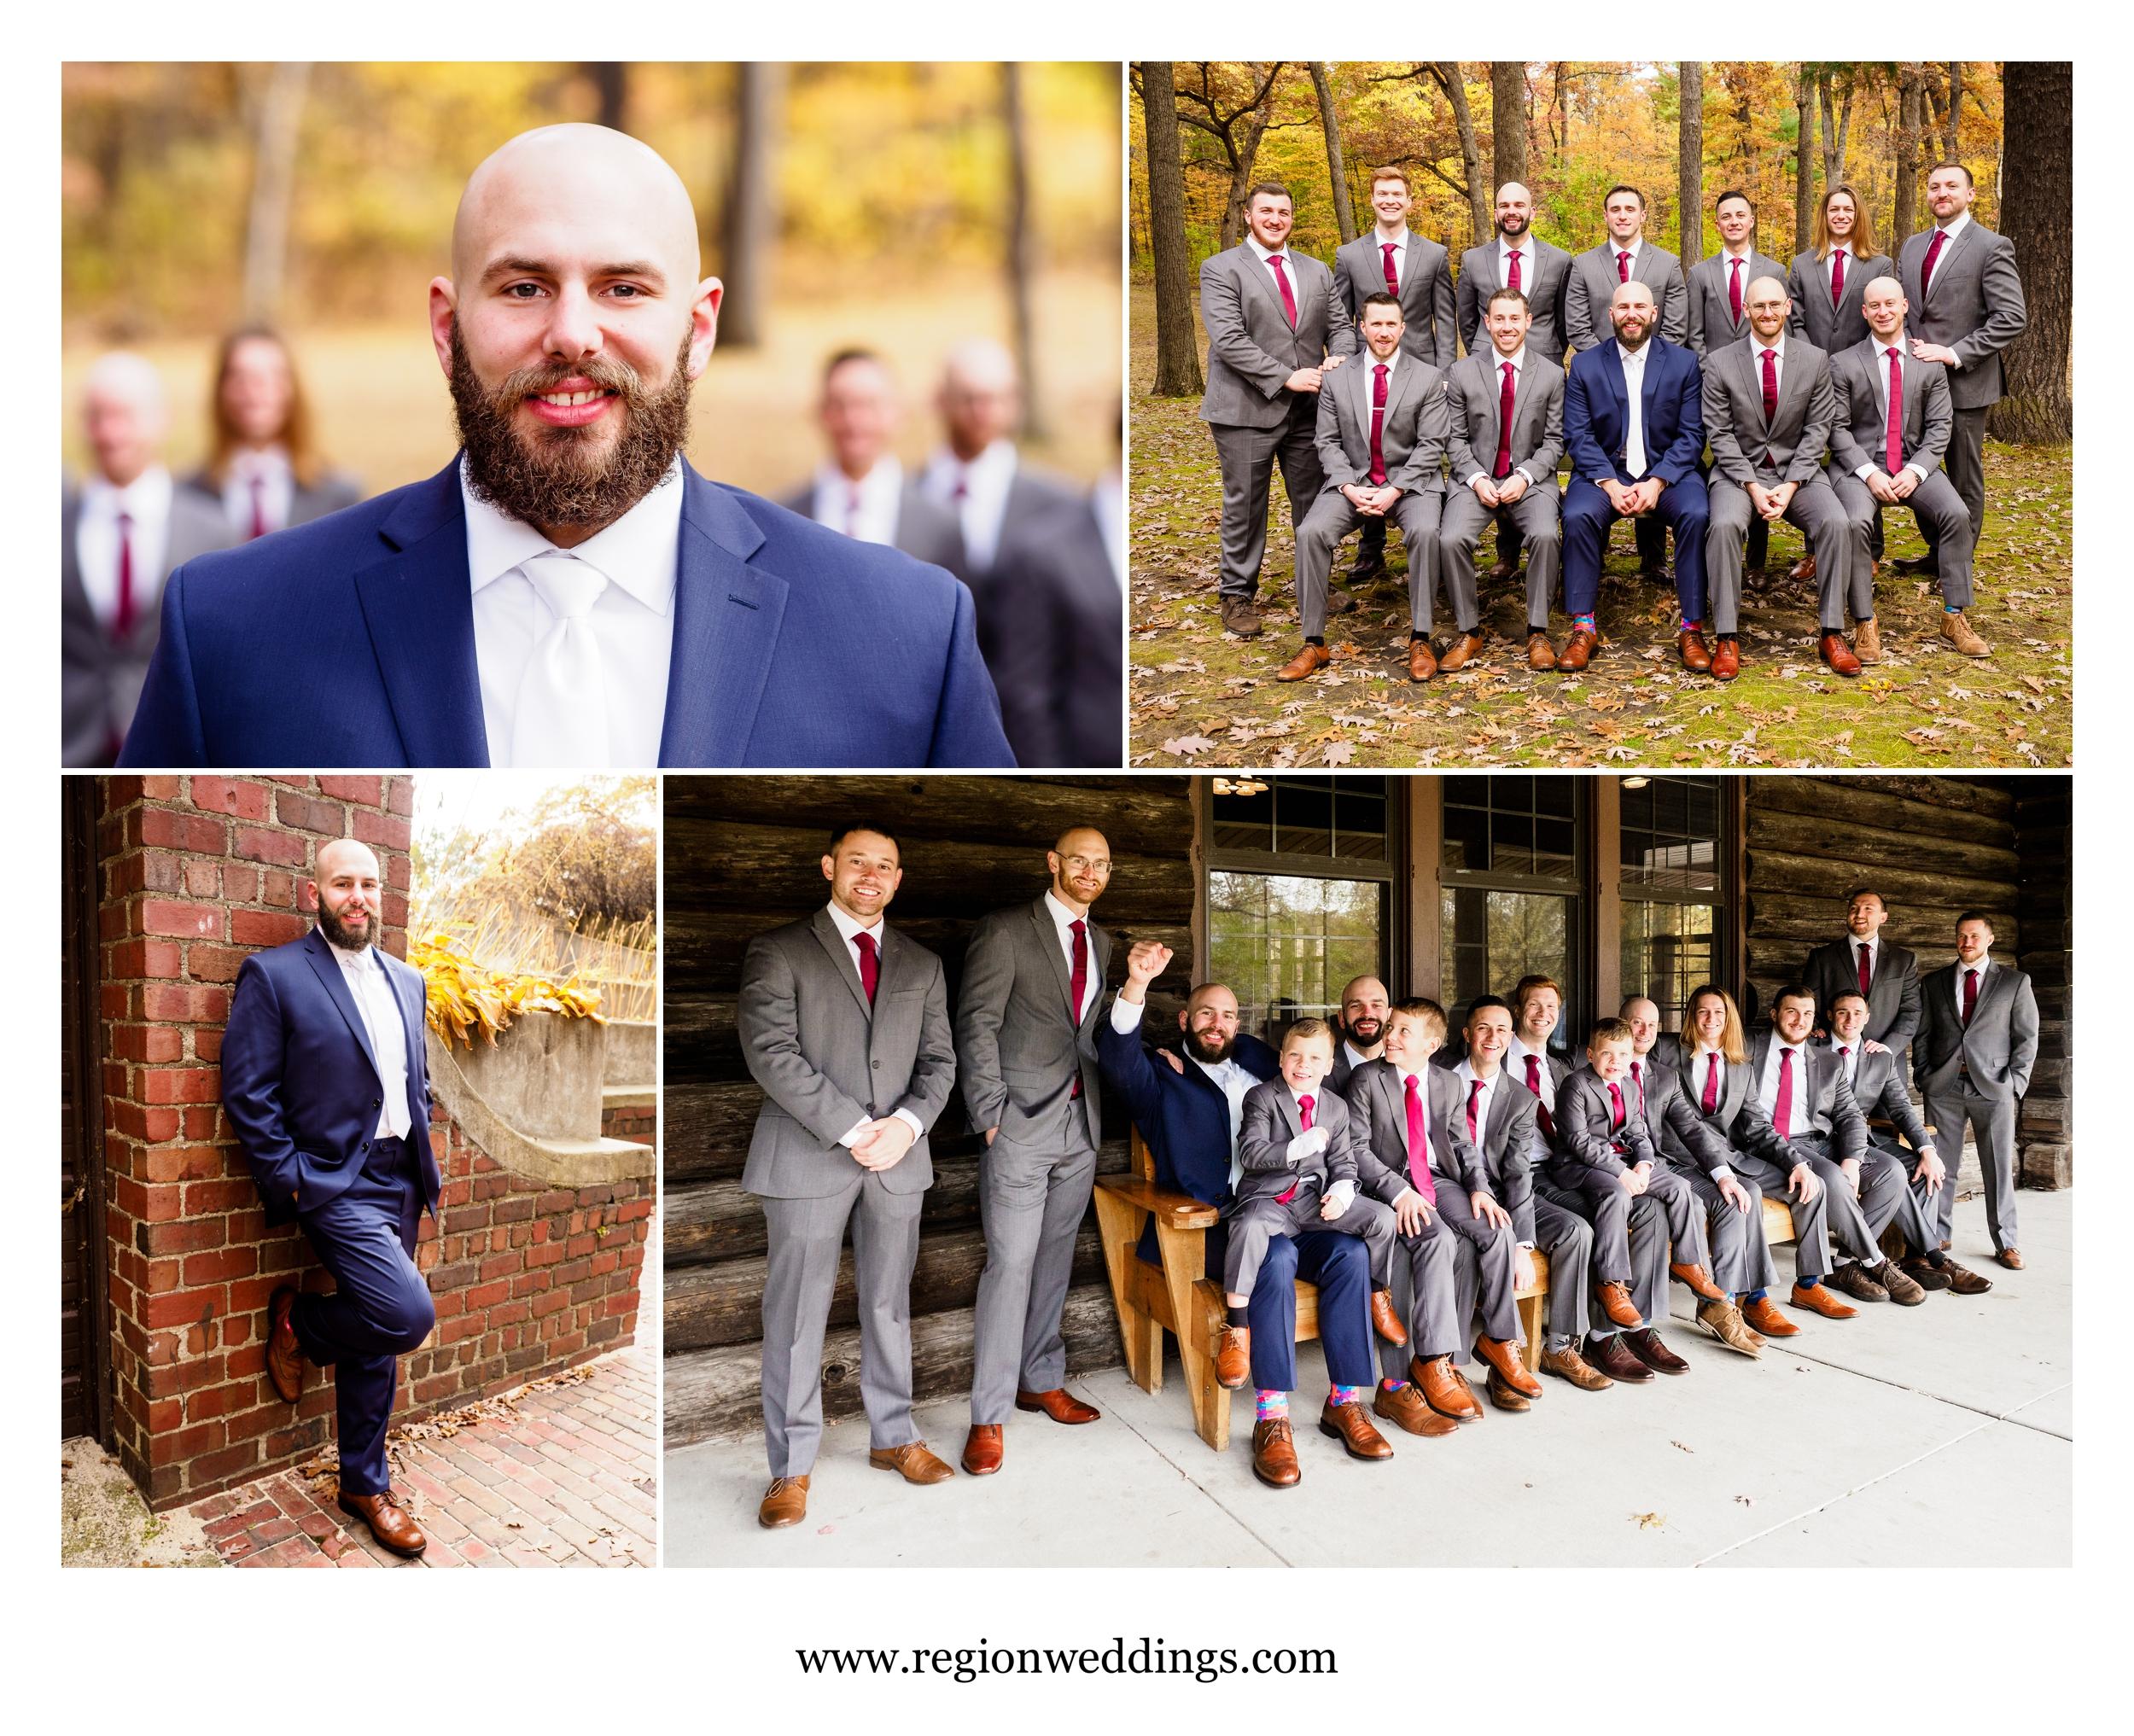 Groom and his groomsmen at Kreuger Memorial Hall.